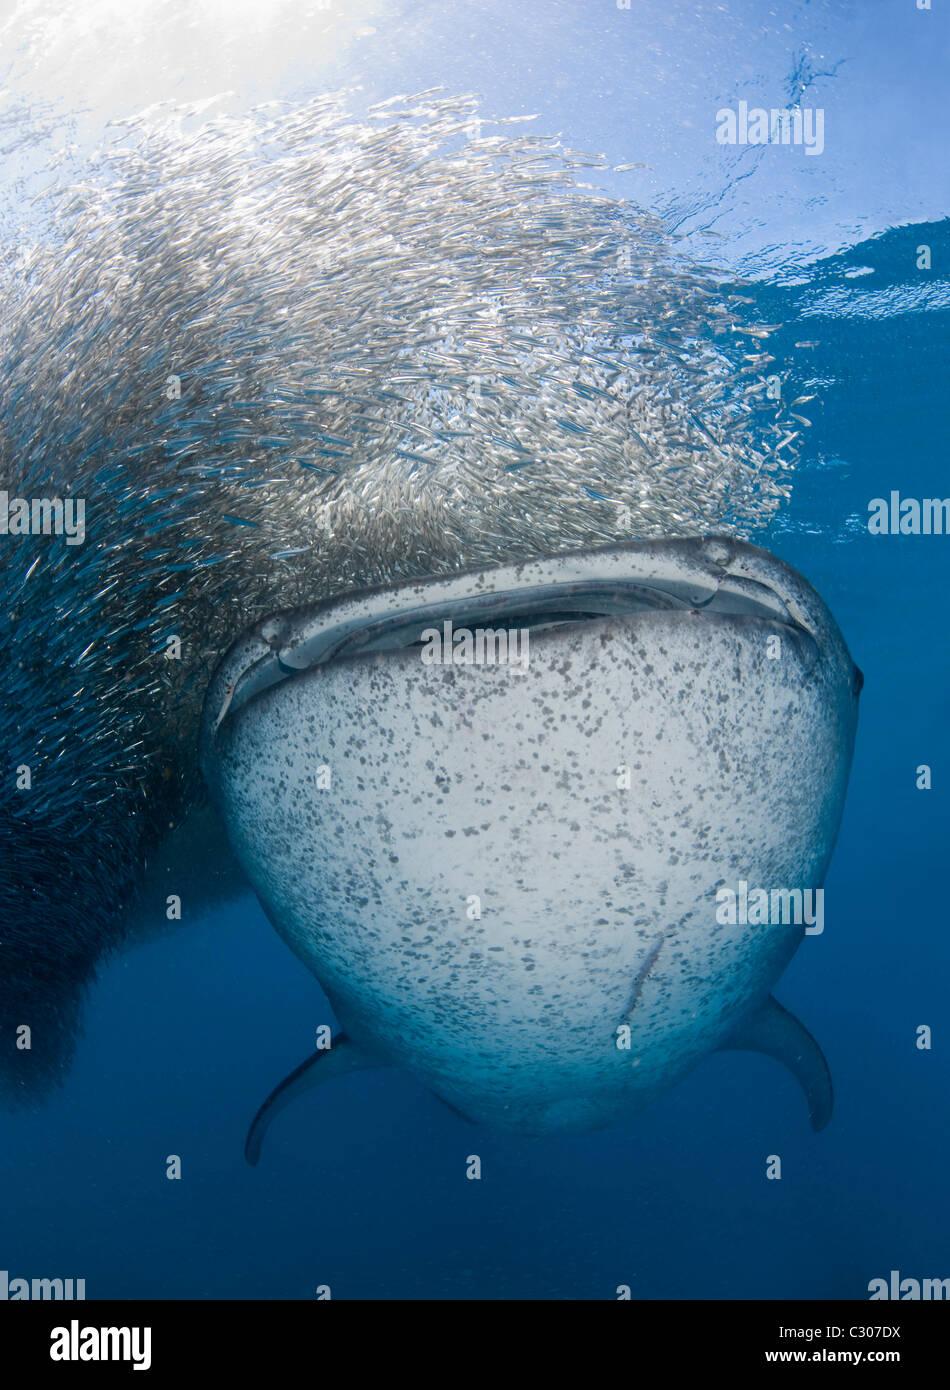 Requin-baleine (Rhincodon typus) se nourrissant de baitball de silversides Photo Stock